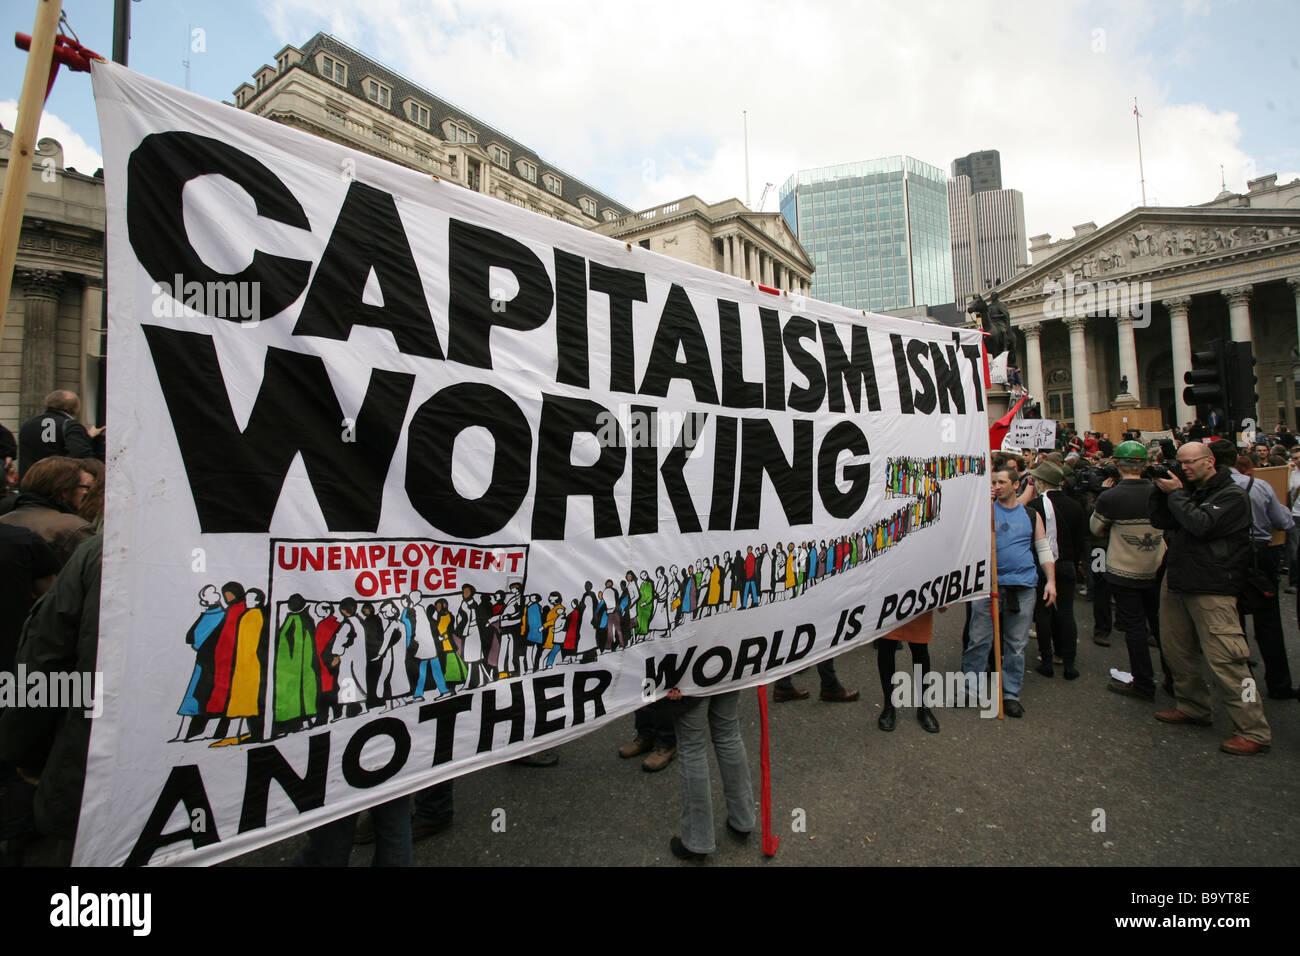 Anti-capitalist demonstrators outside Bank of England, during G20 summit, City of London, UK - Stock Image